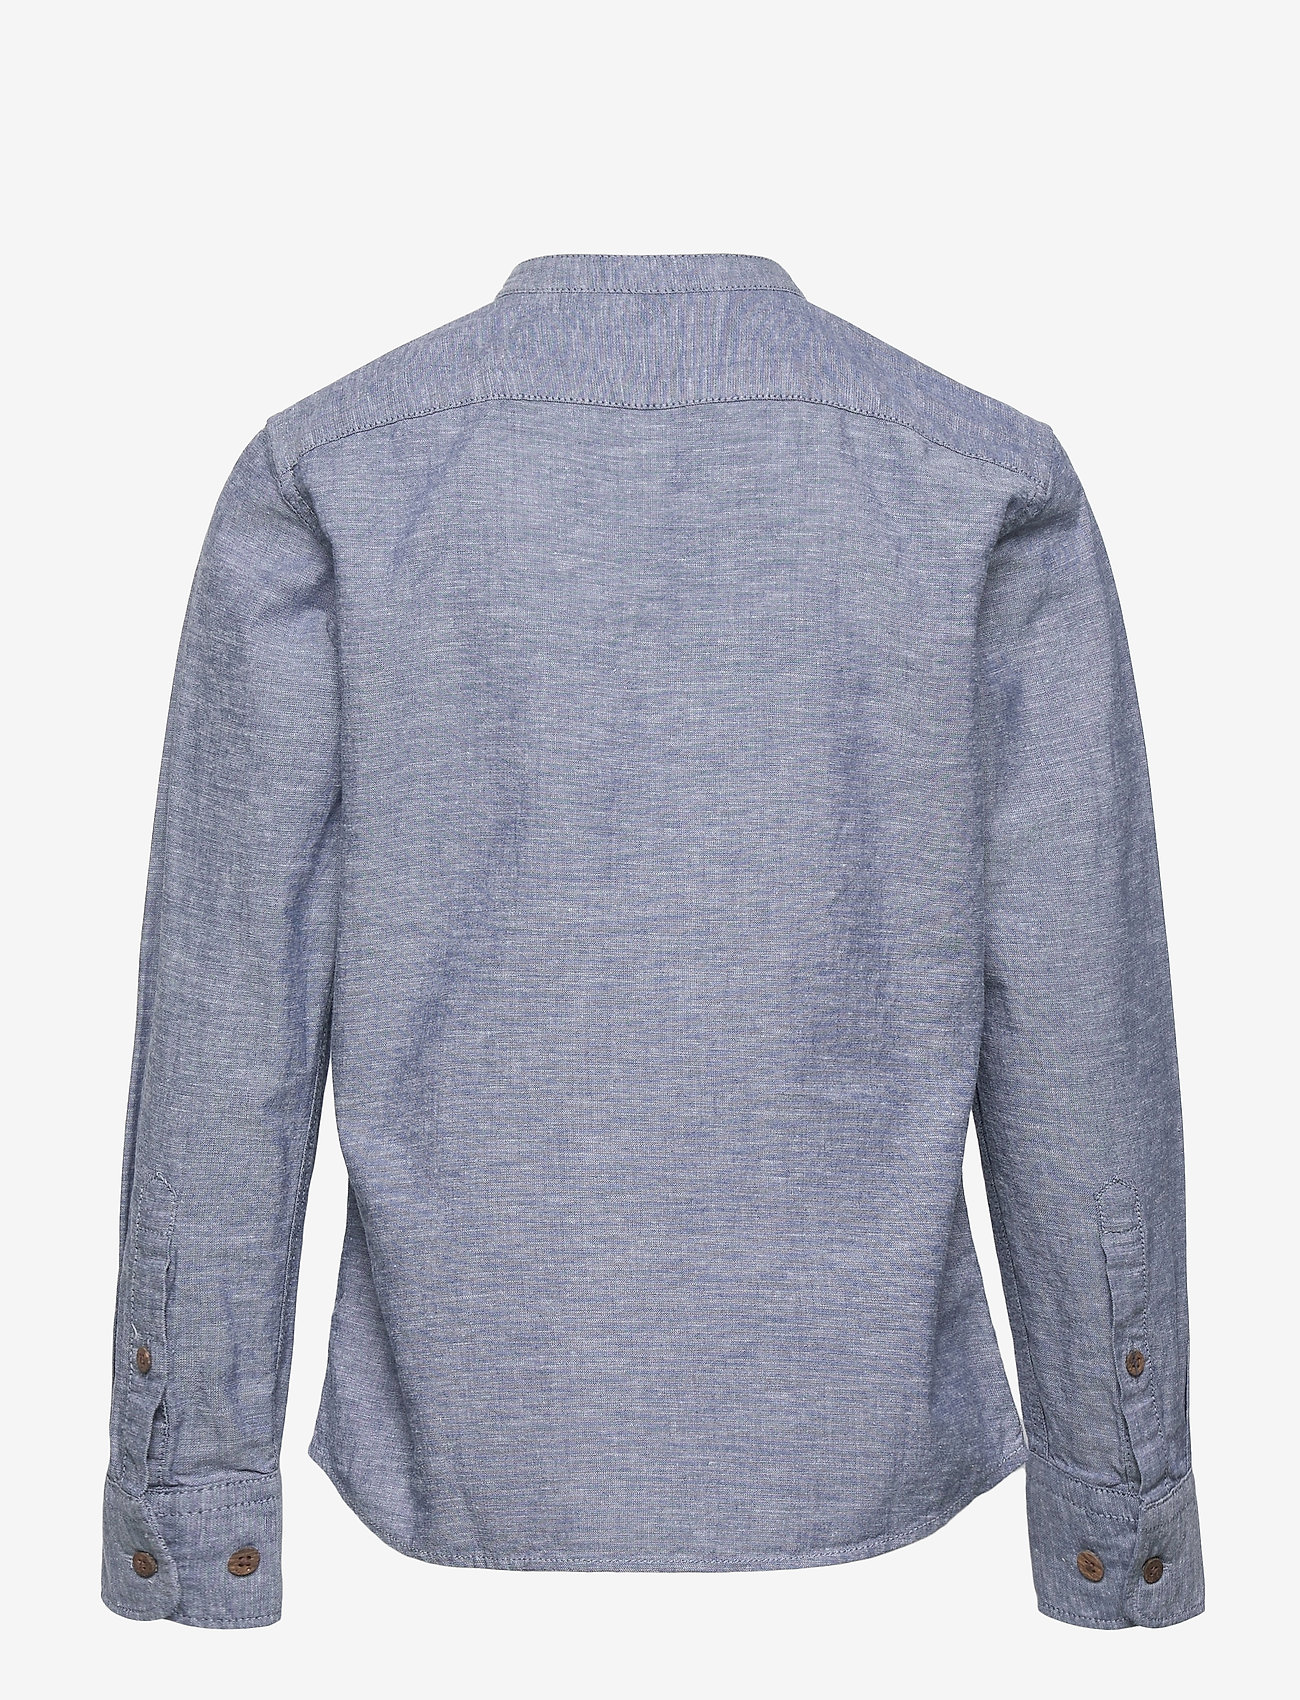 Jack & Jones - JPRBLASUMMER BAND TUNIC SHIRT L/S JR - shirts - faded denim - 1